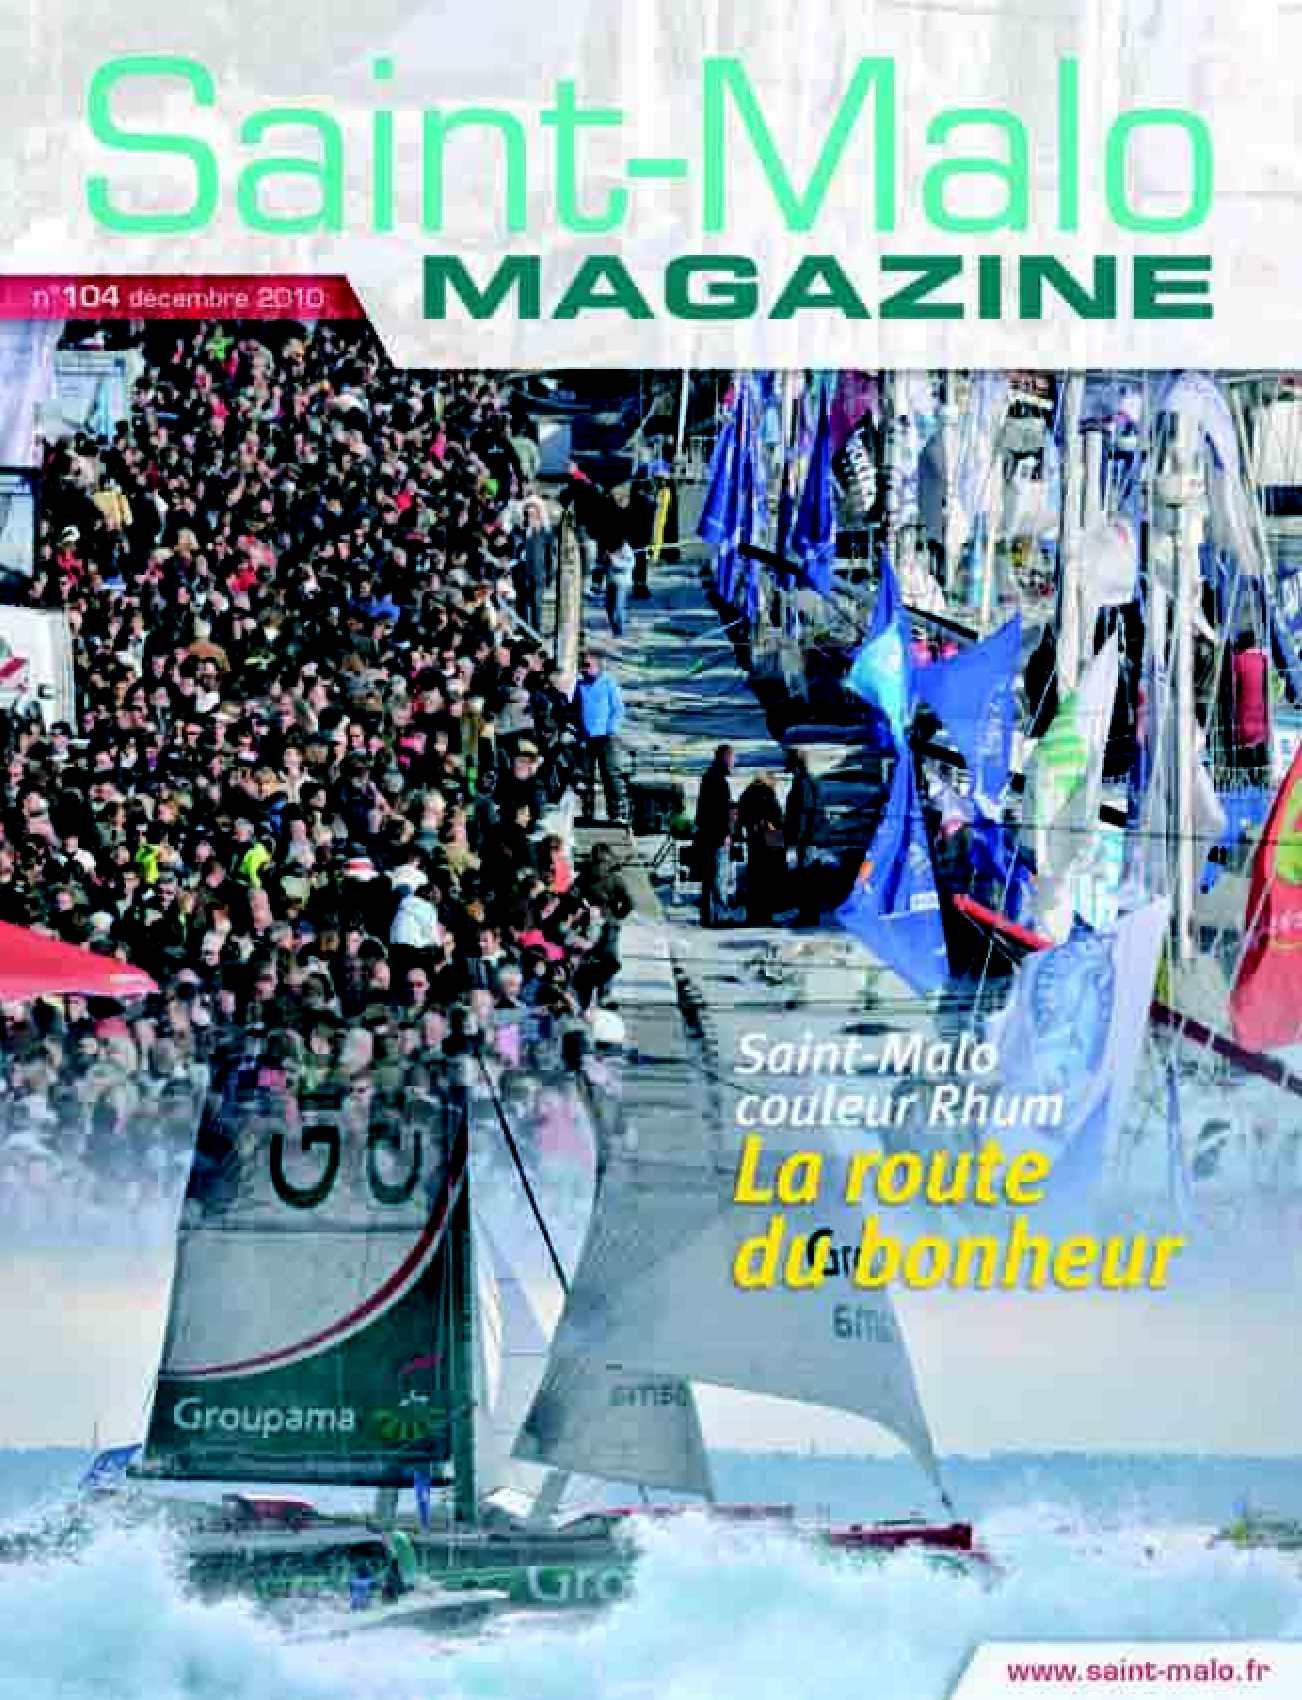 Calam o saint malo magazine 104 for La fontaine aux cuisines